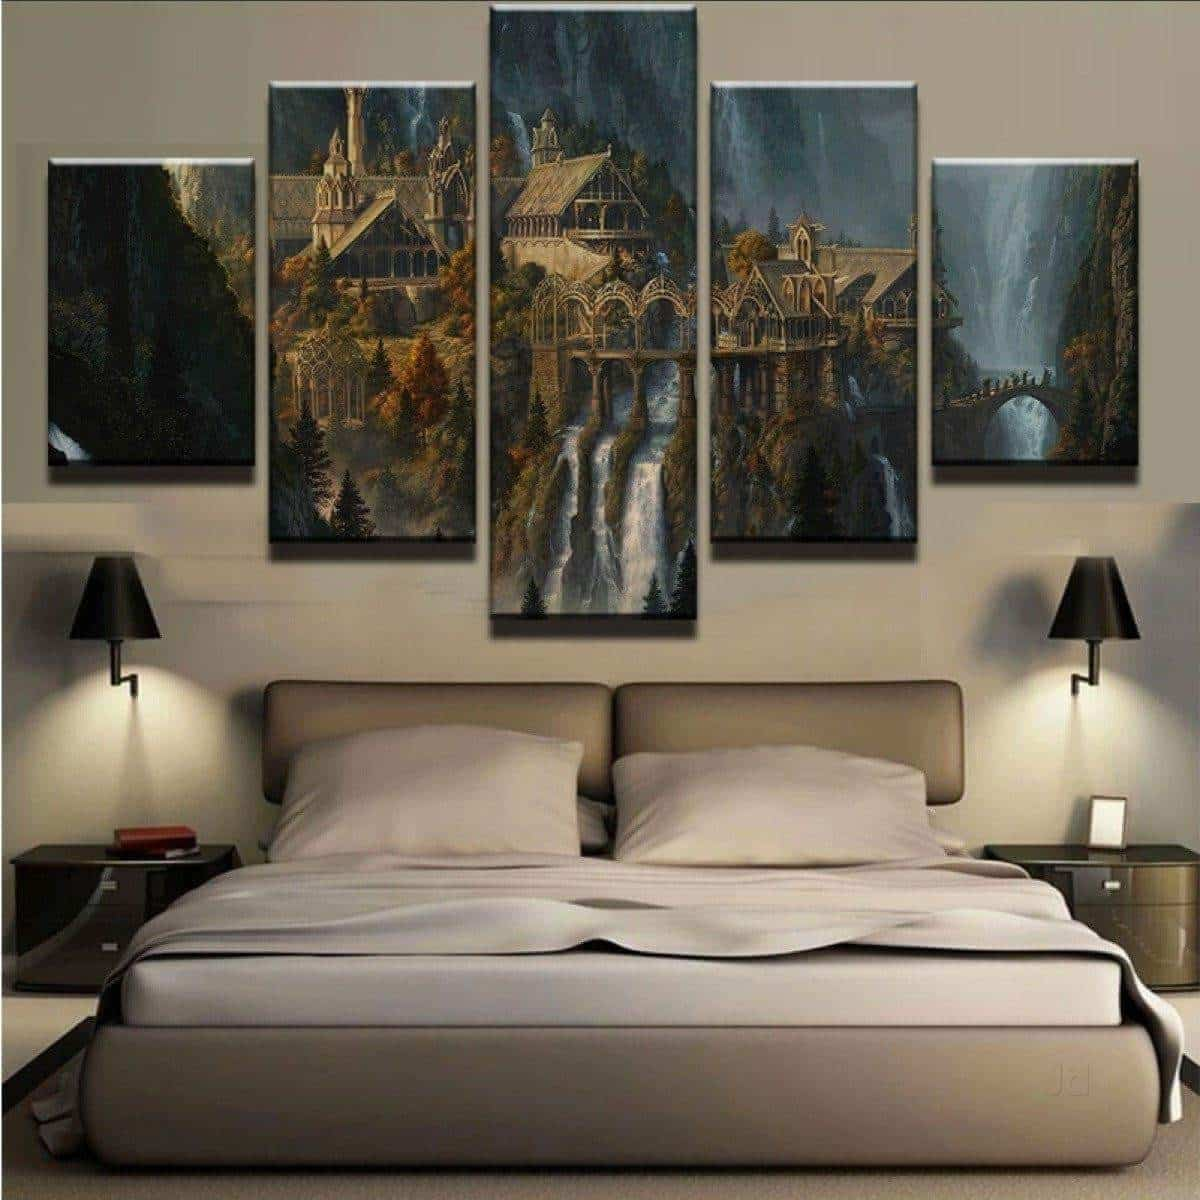 modern art furniture. idus furniture photos, c g road, ahmedabad - carpenters modern art